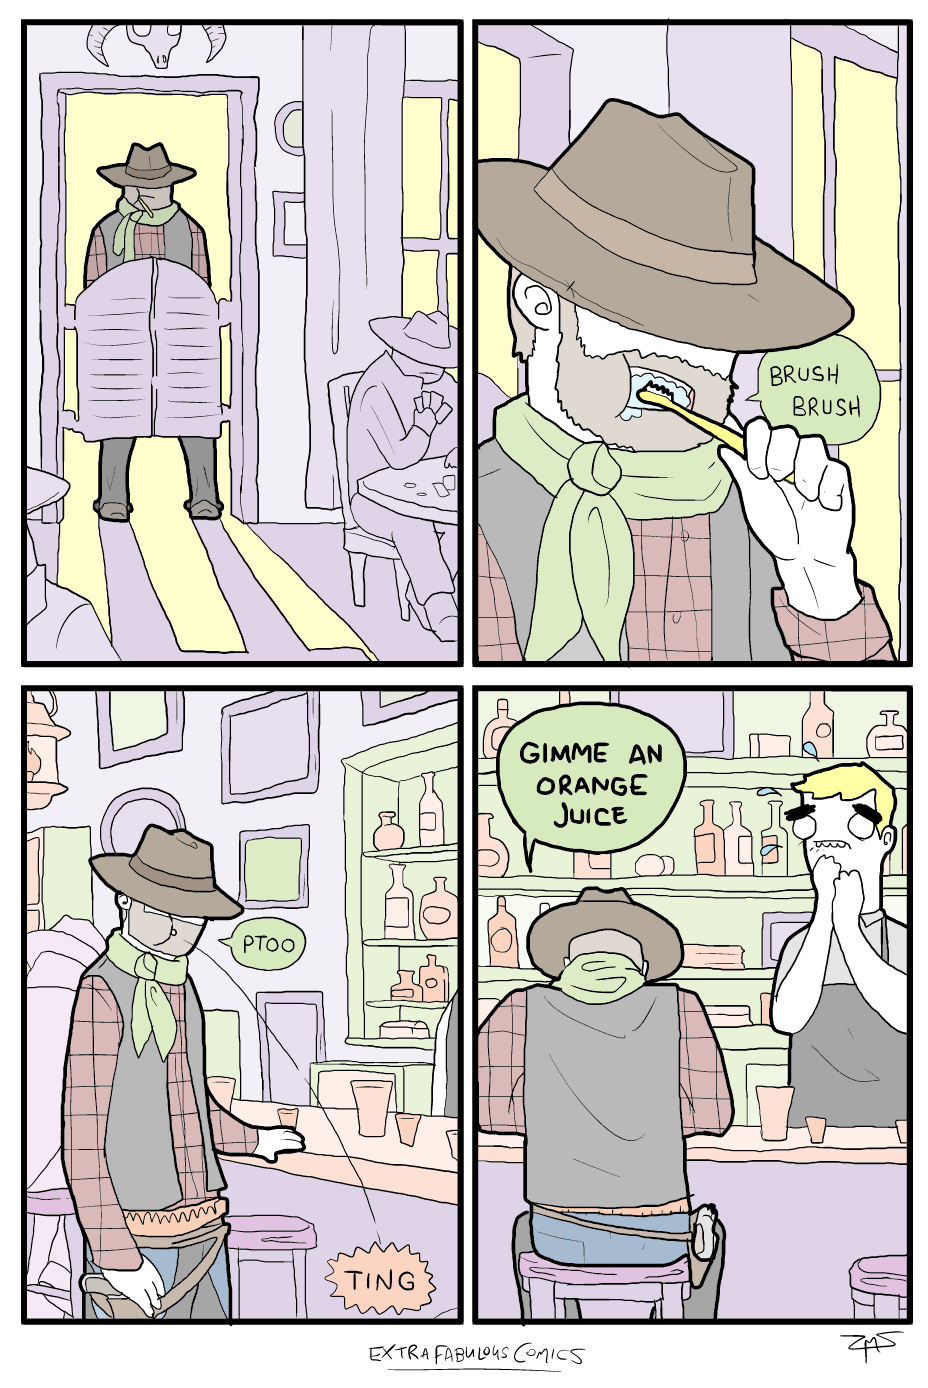 cowboy-brosse-dents